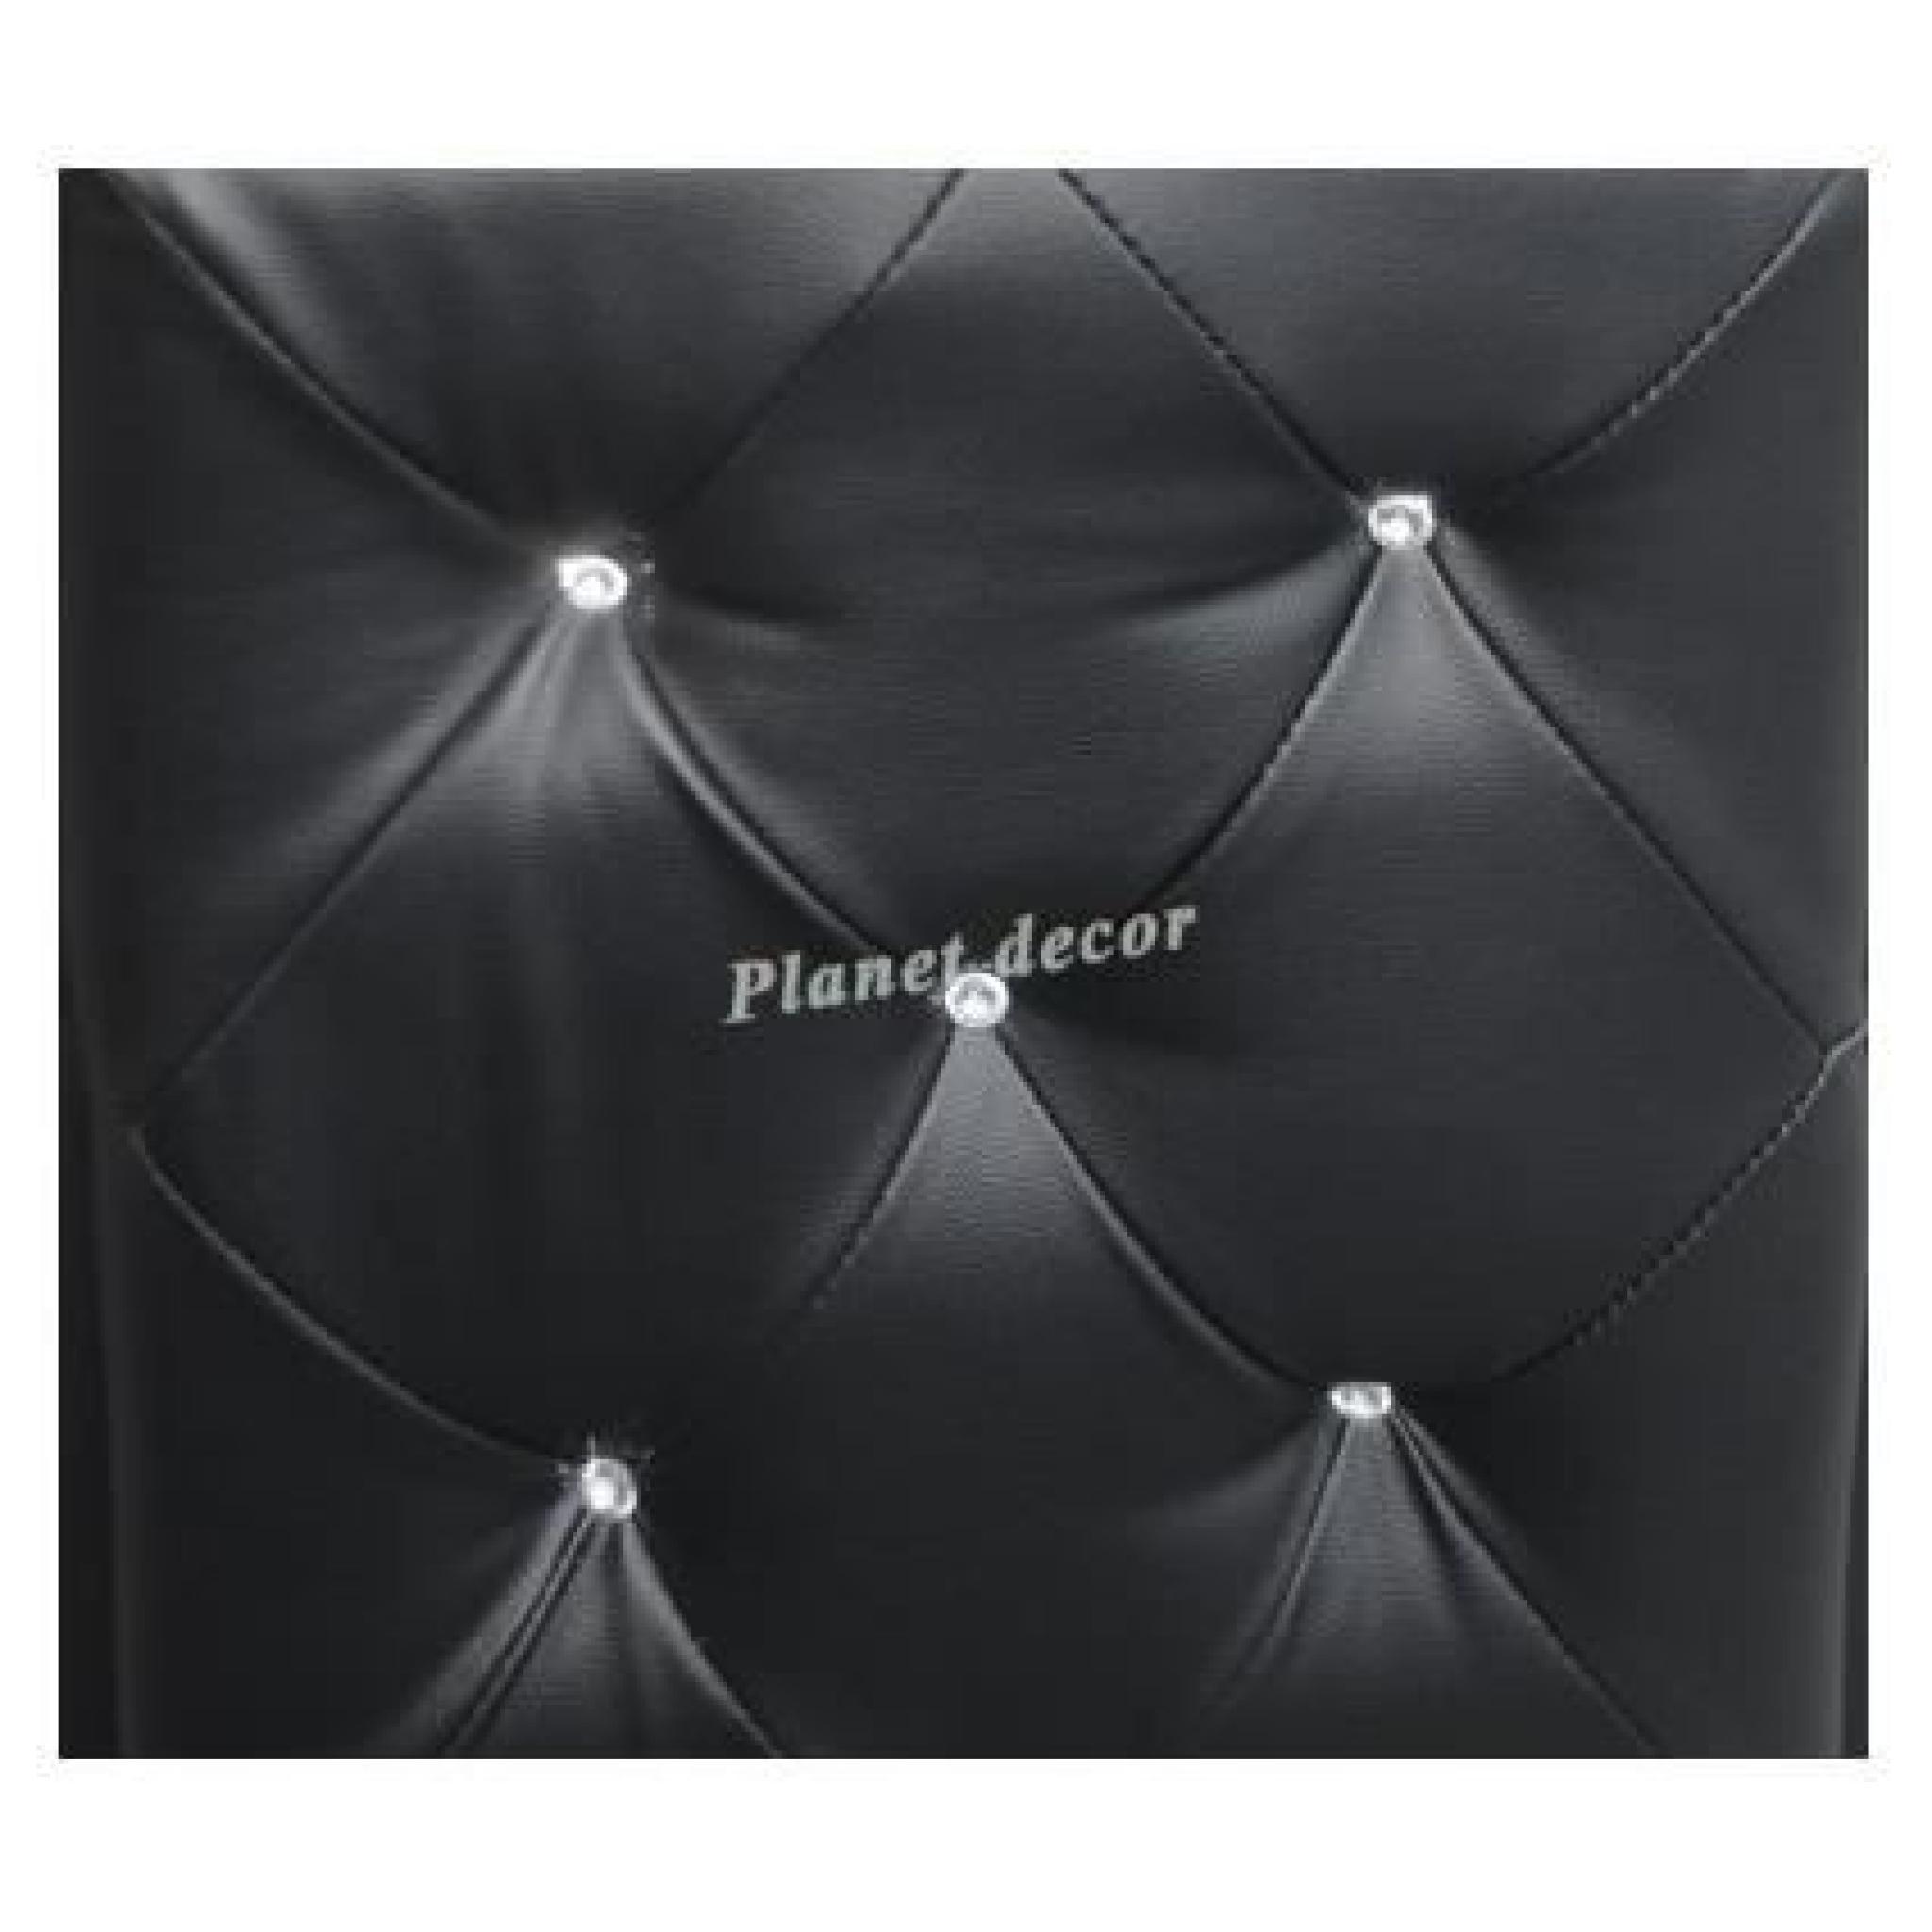 ensemble commode et miroir similicuir coloris noir avec strass astana pas cher - Miroir Mural Blanc Simili Cuir Strass